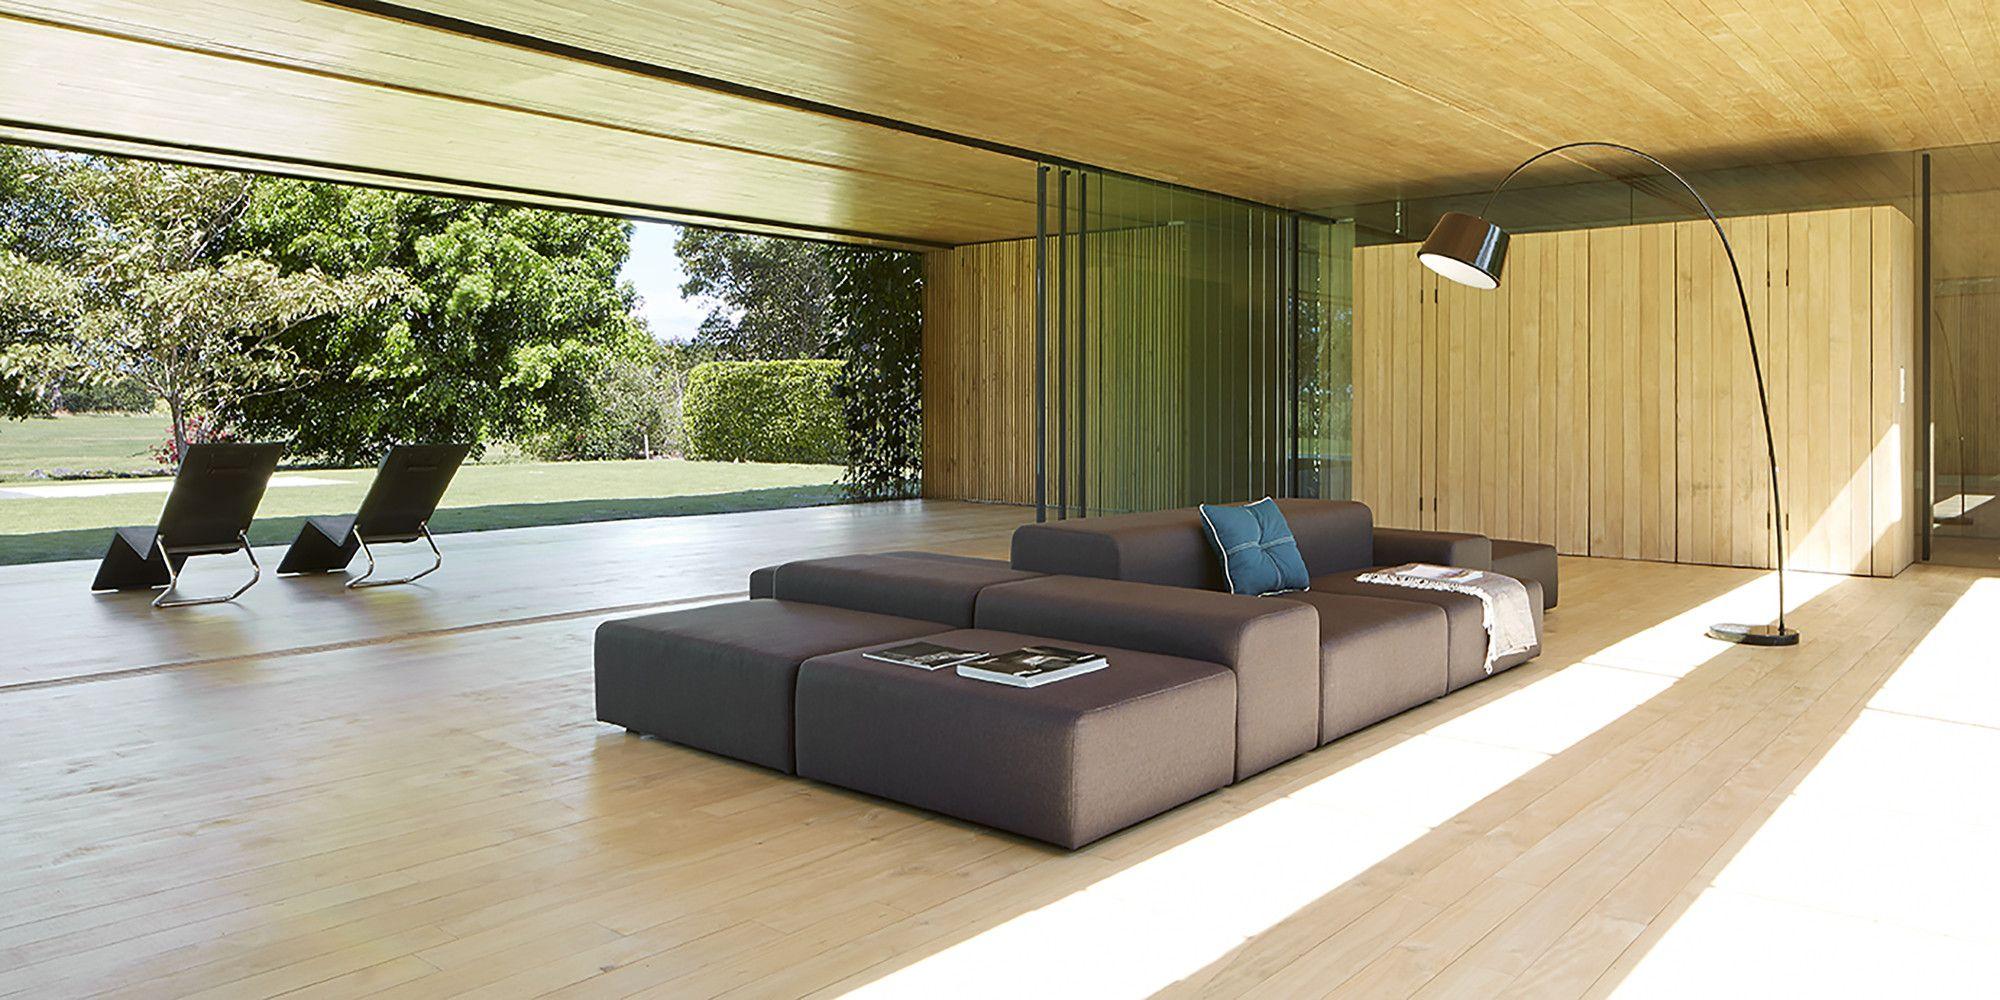 INOUT House,© Jordi Miralles